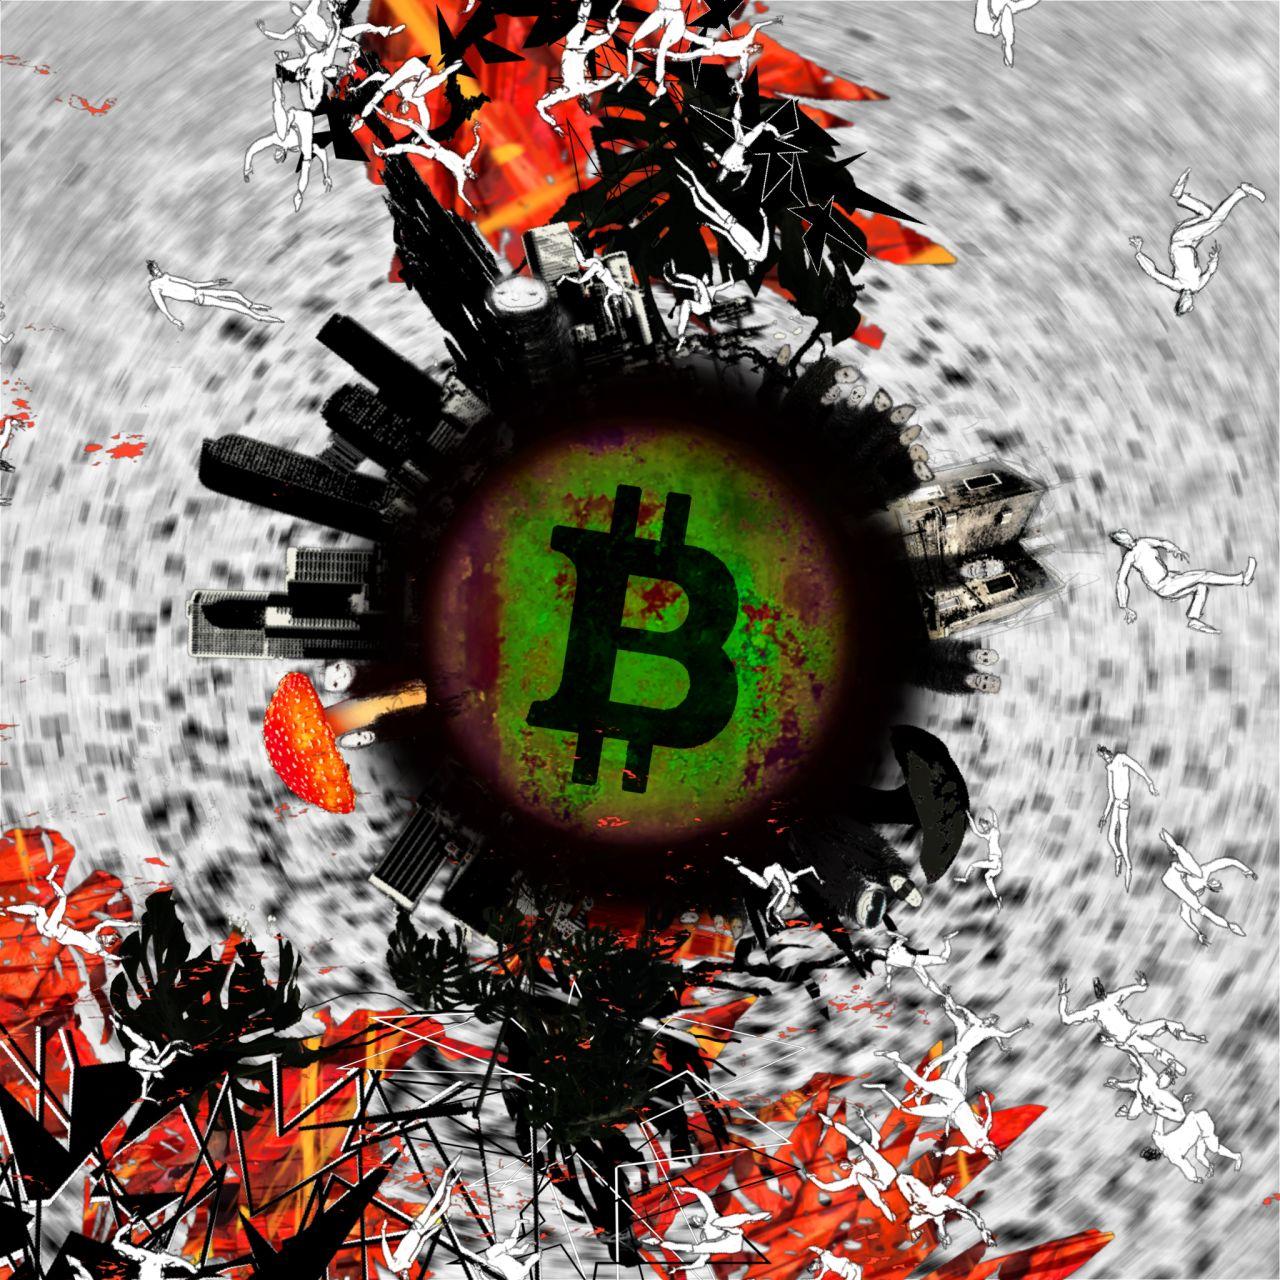 Bitcoin Makes the World Go Around